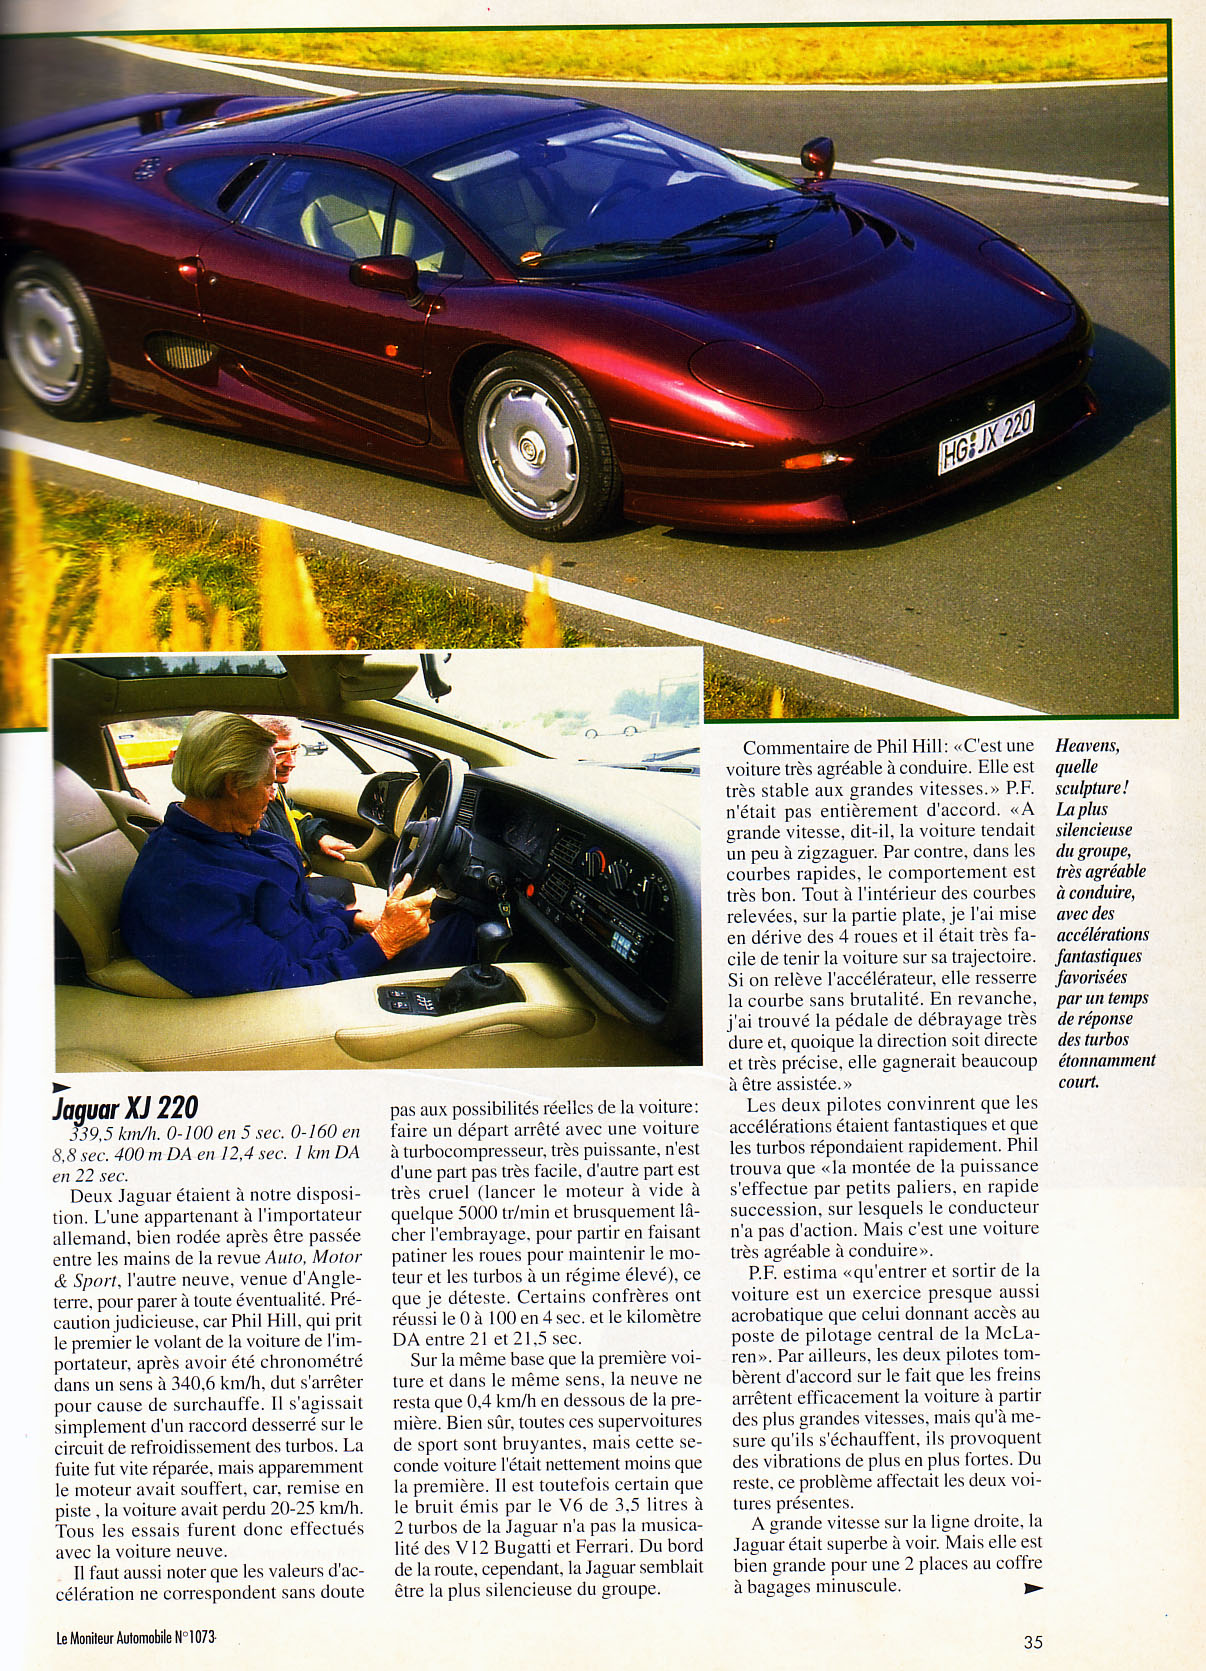 ruf btr 3 8 vs ferrari 456 gt vs jaguar xj220 vs bugatti eb 110 le moniteur automobile mag fr. Black Bedroom Furniture Sets. Home Design Ideas